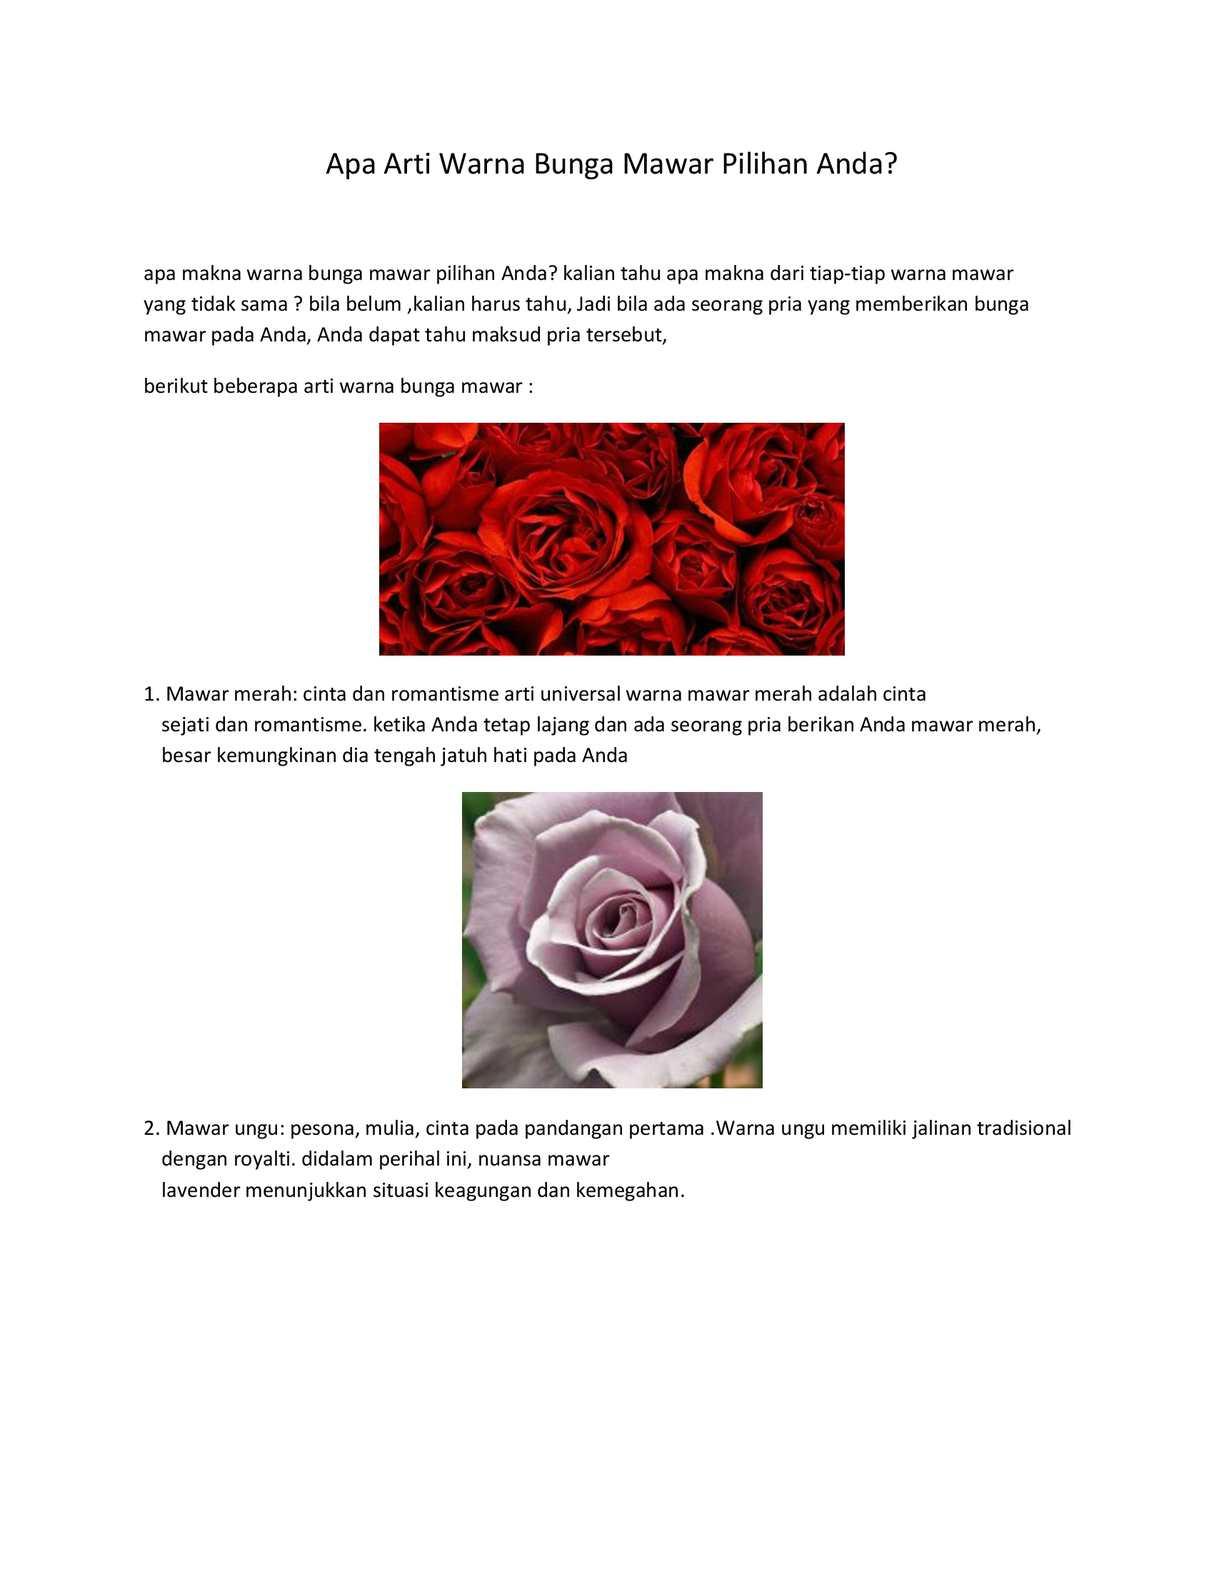 Calameo Apa Arti Warna Bunga Mawar Pilihan Anda